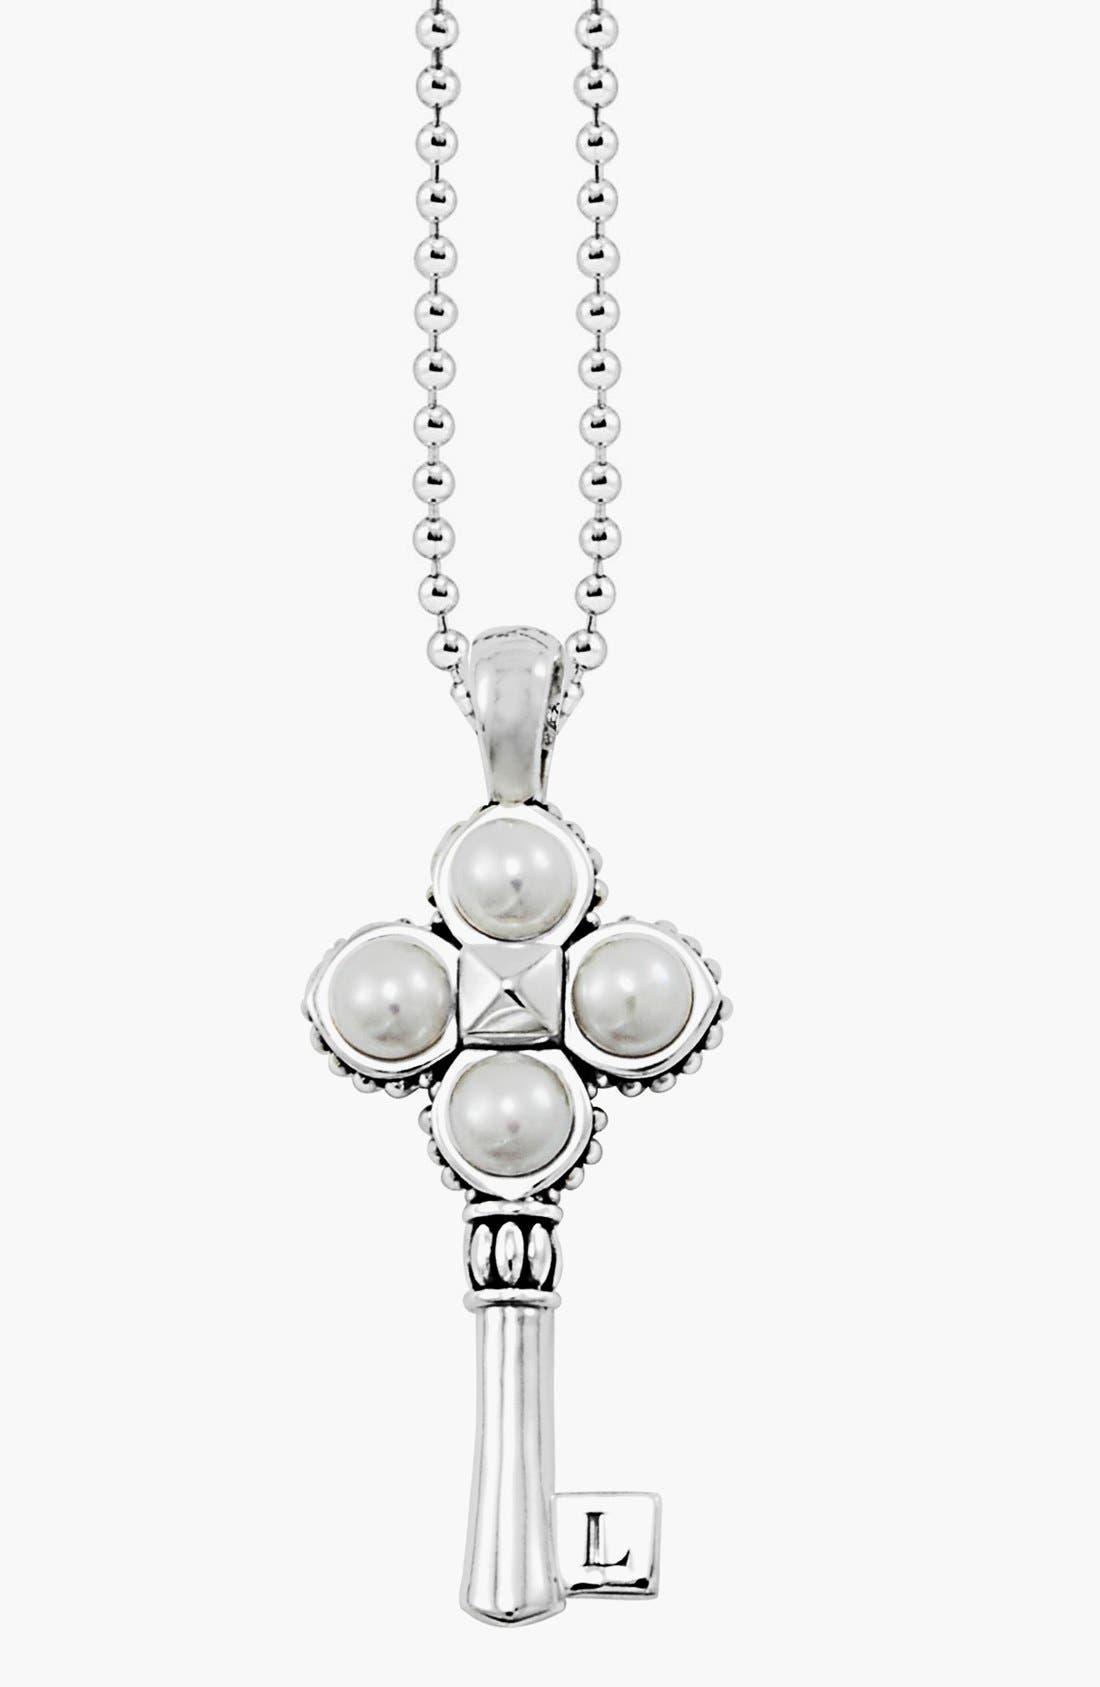 LAGOS Luna Pearl Long Key Pendant Necklace